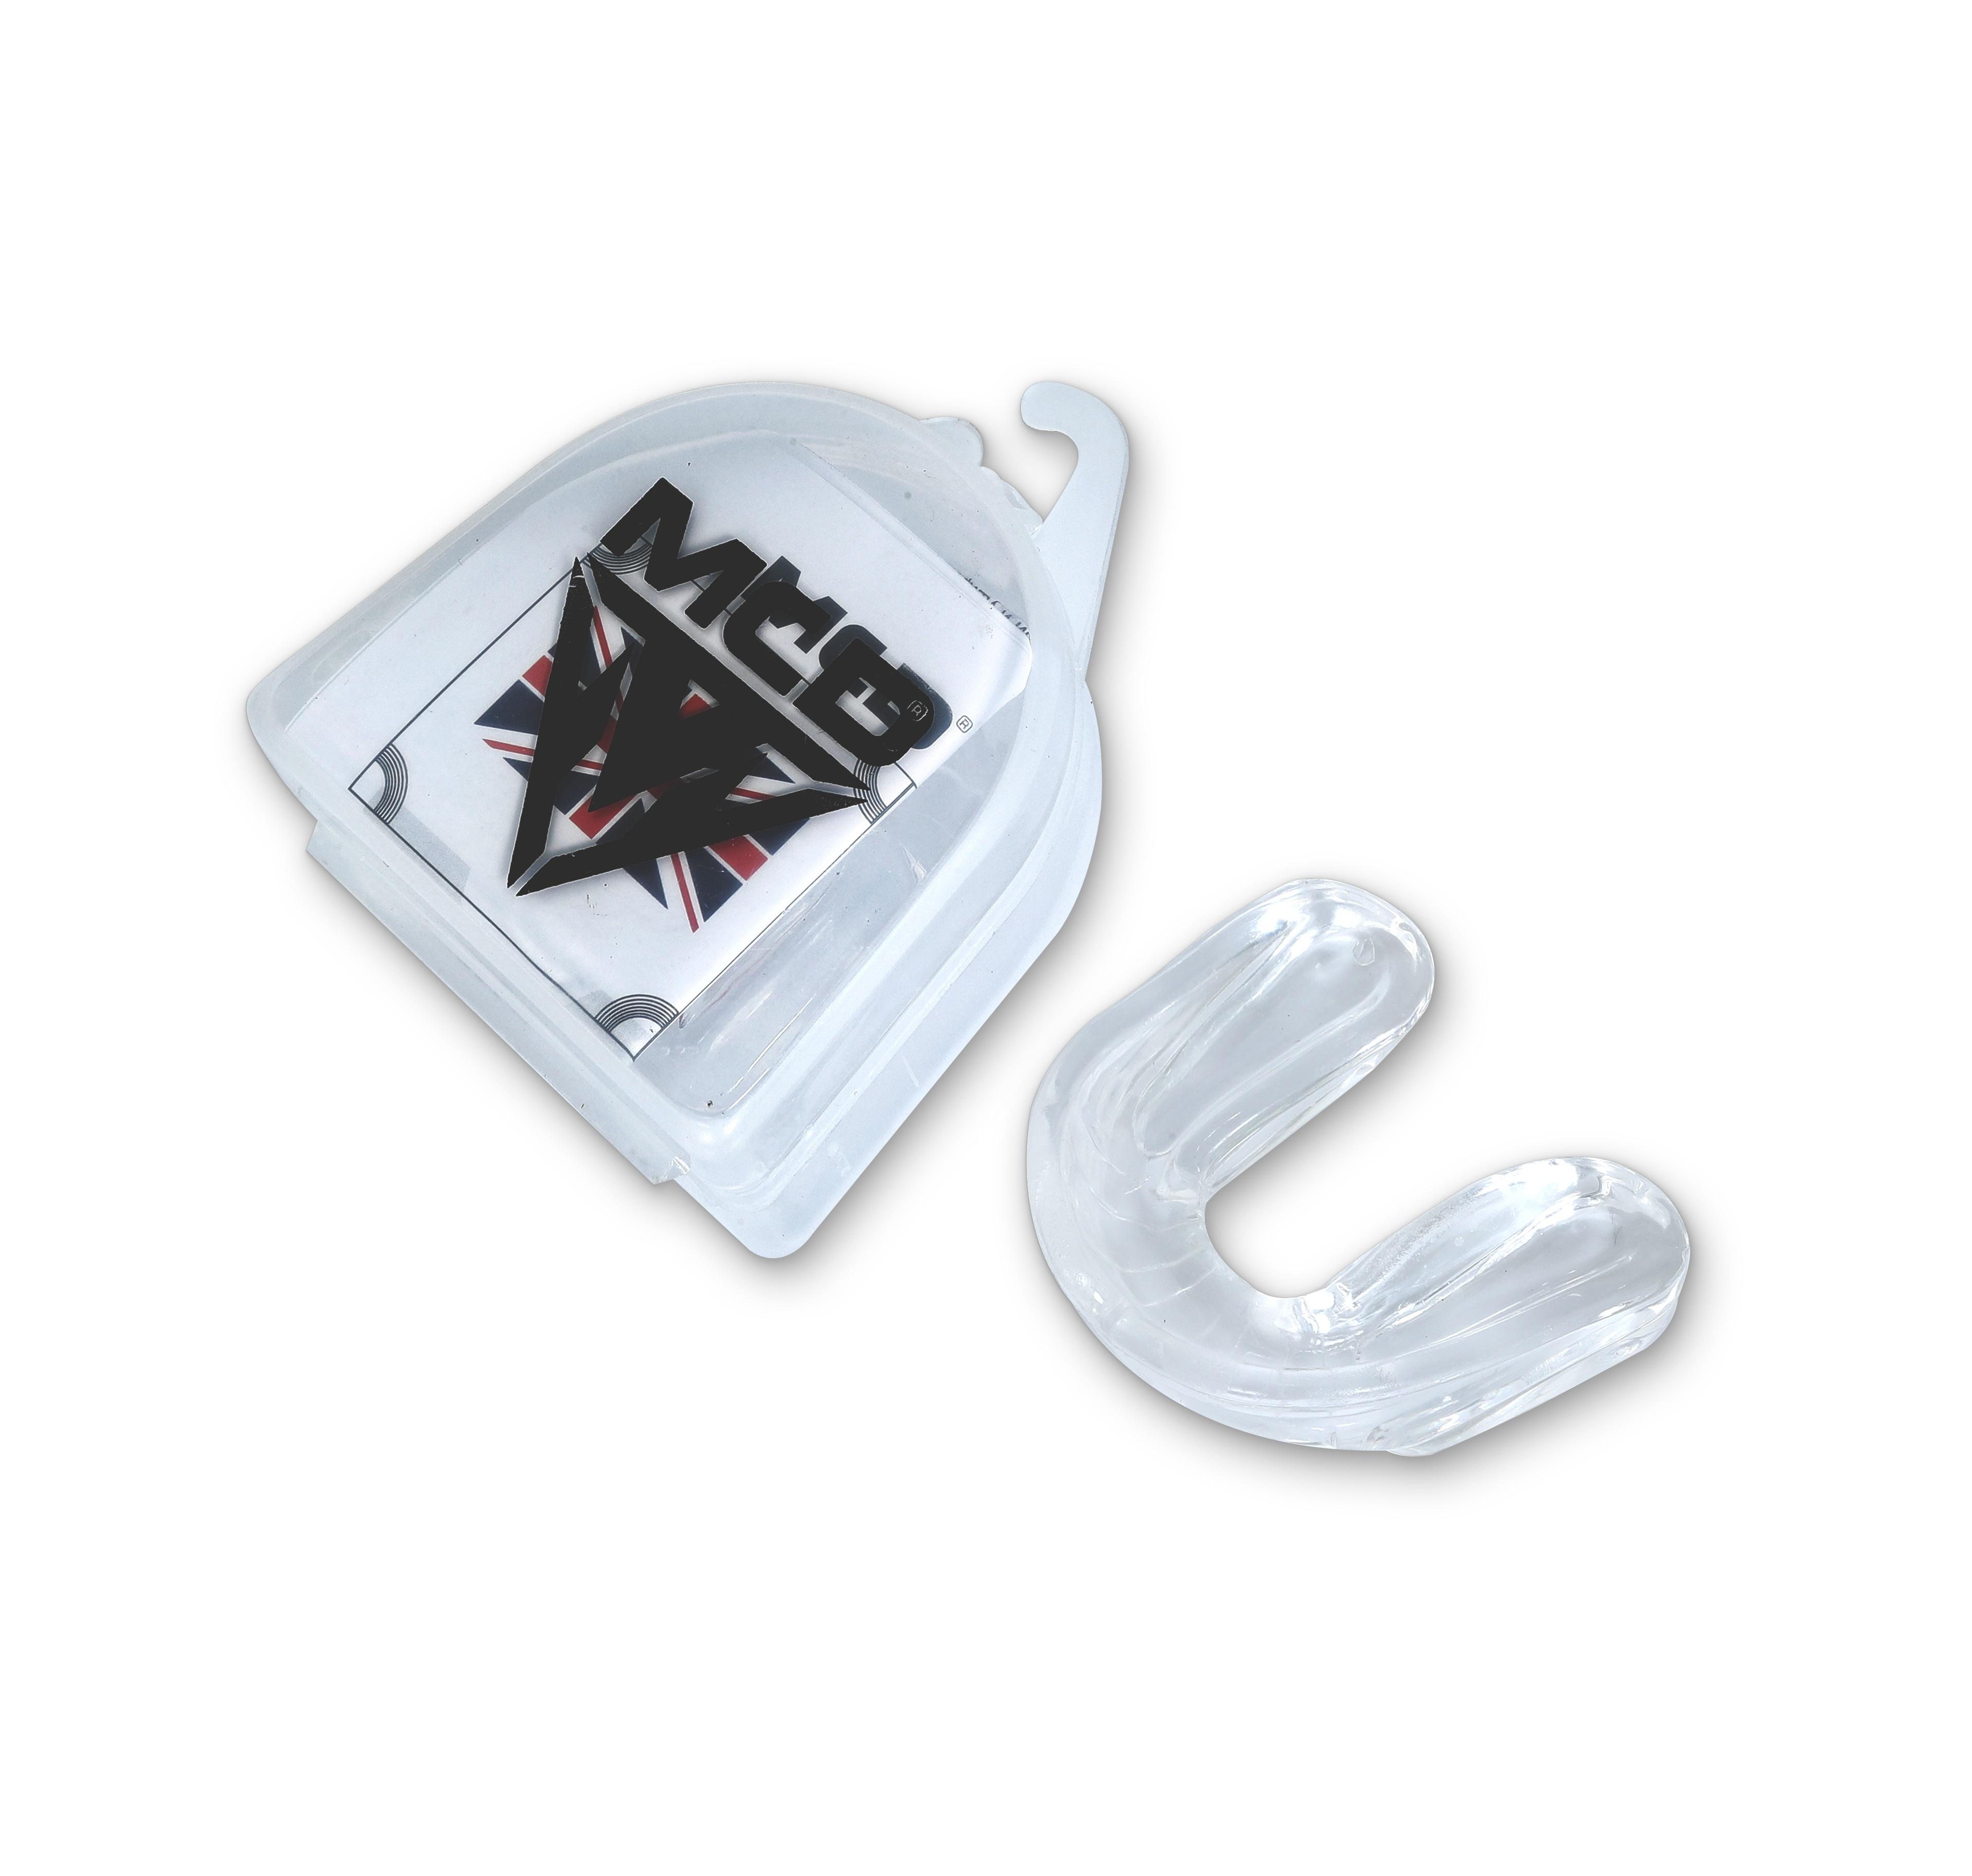 MCD Mouth Guard Gum Protector Teeth Guard boxing, kickboxing, wrestling, BJJ, karate, Muay Thai, taekwondo, judo.